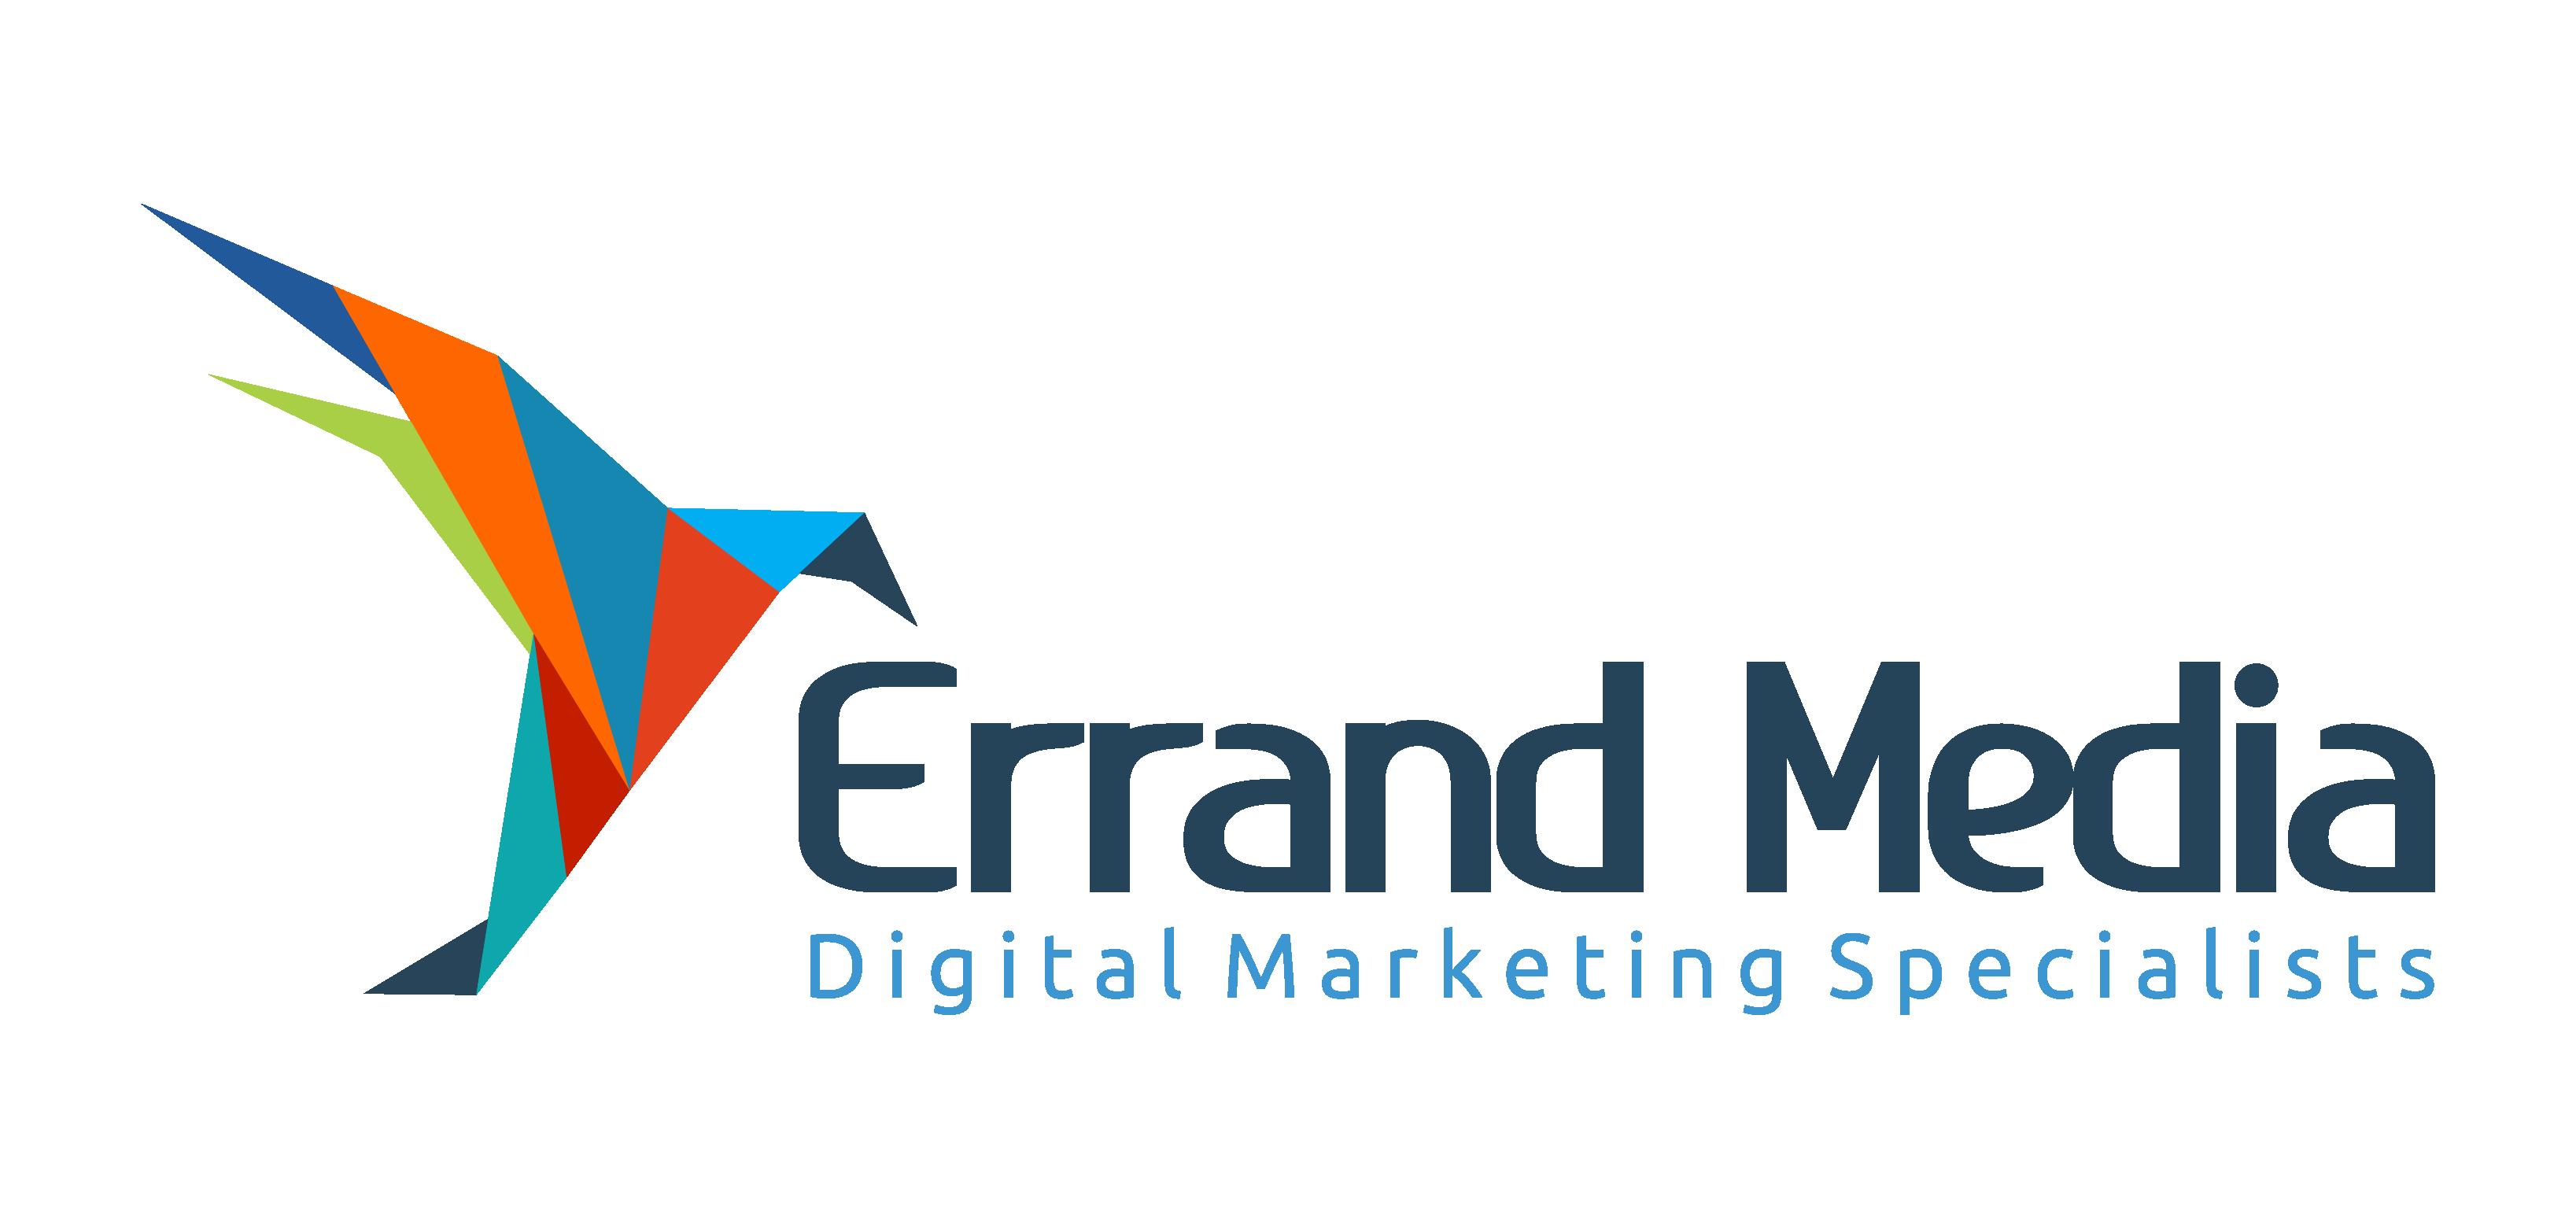 Errandmedia.com